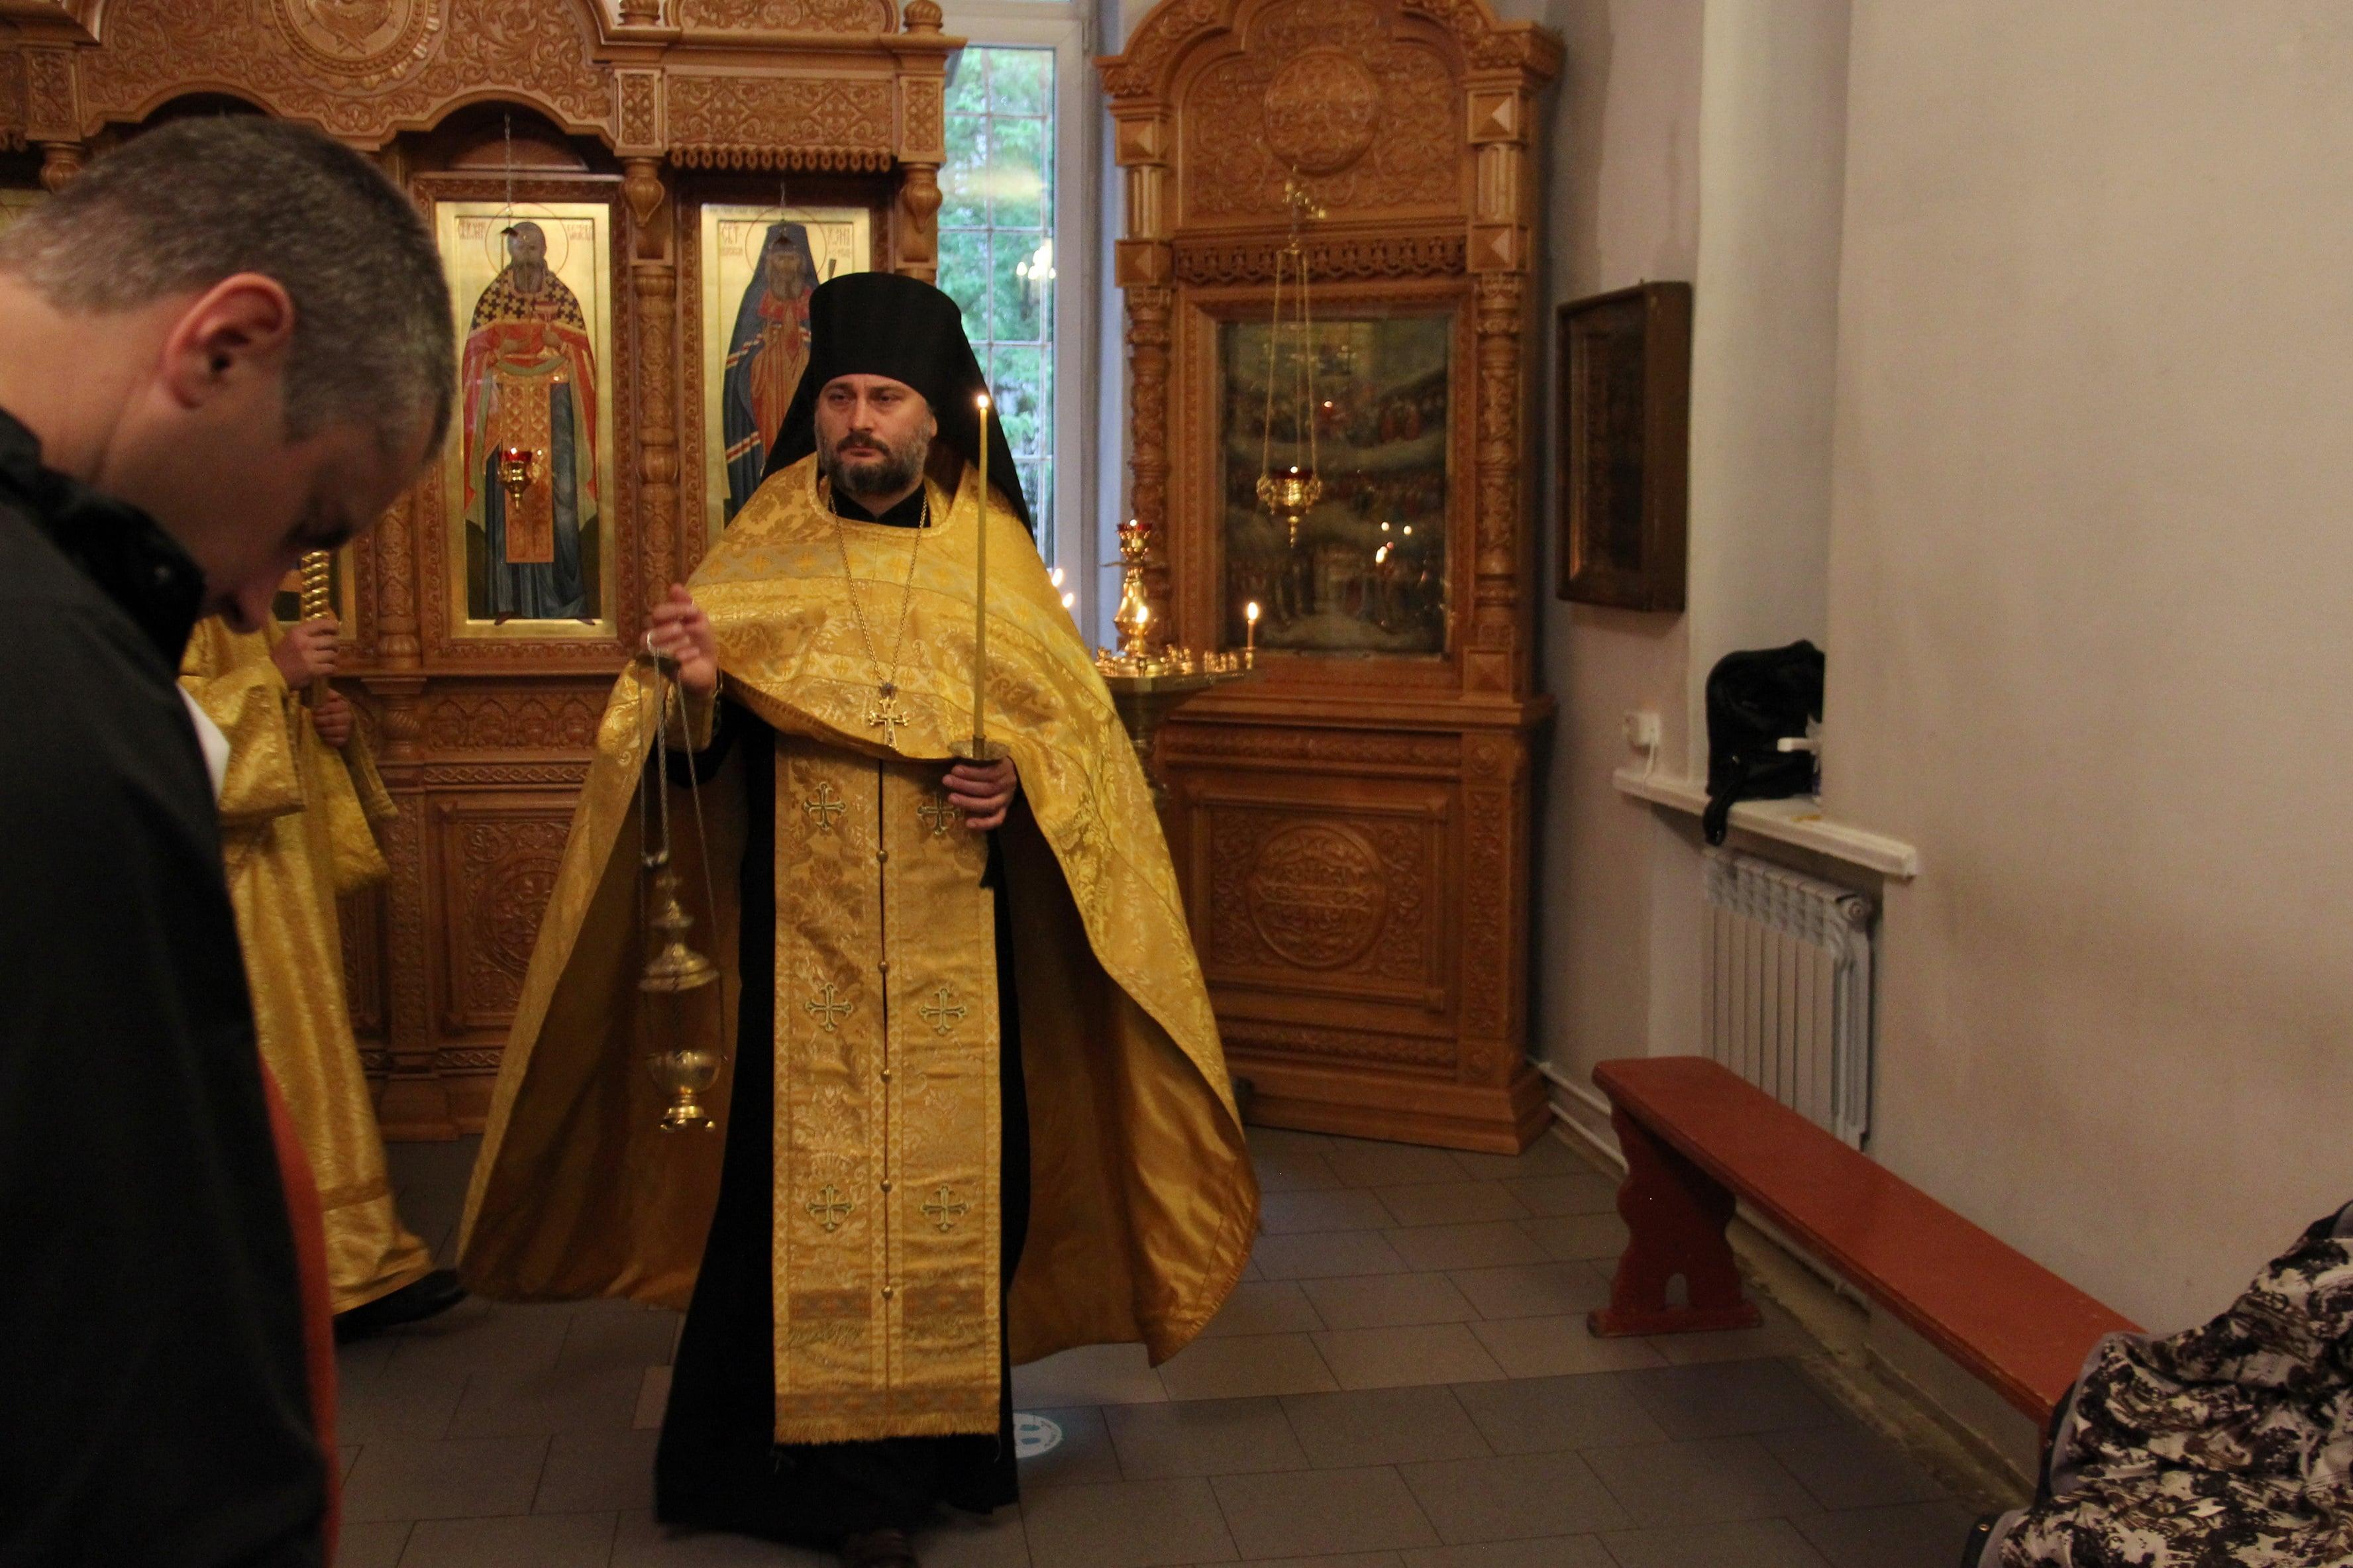 http://monuspen.ru/photoreports/7981735c9eb567a6b2380cde7cc5dd44.JPG